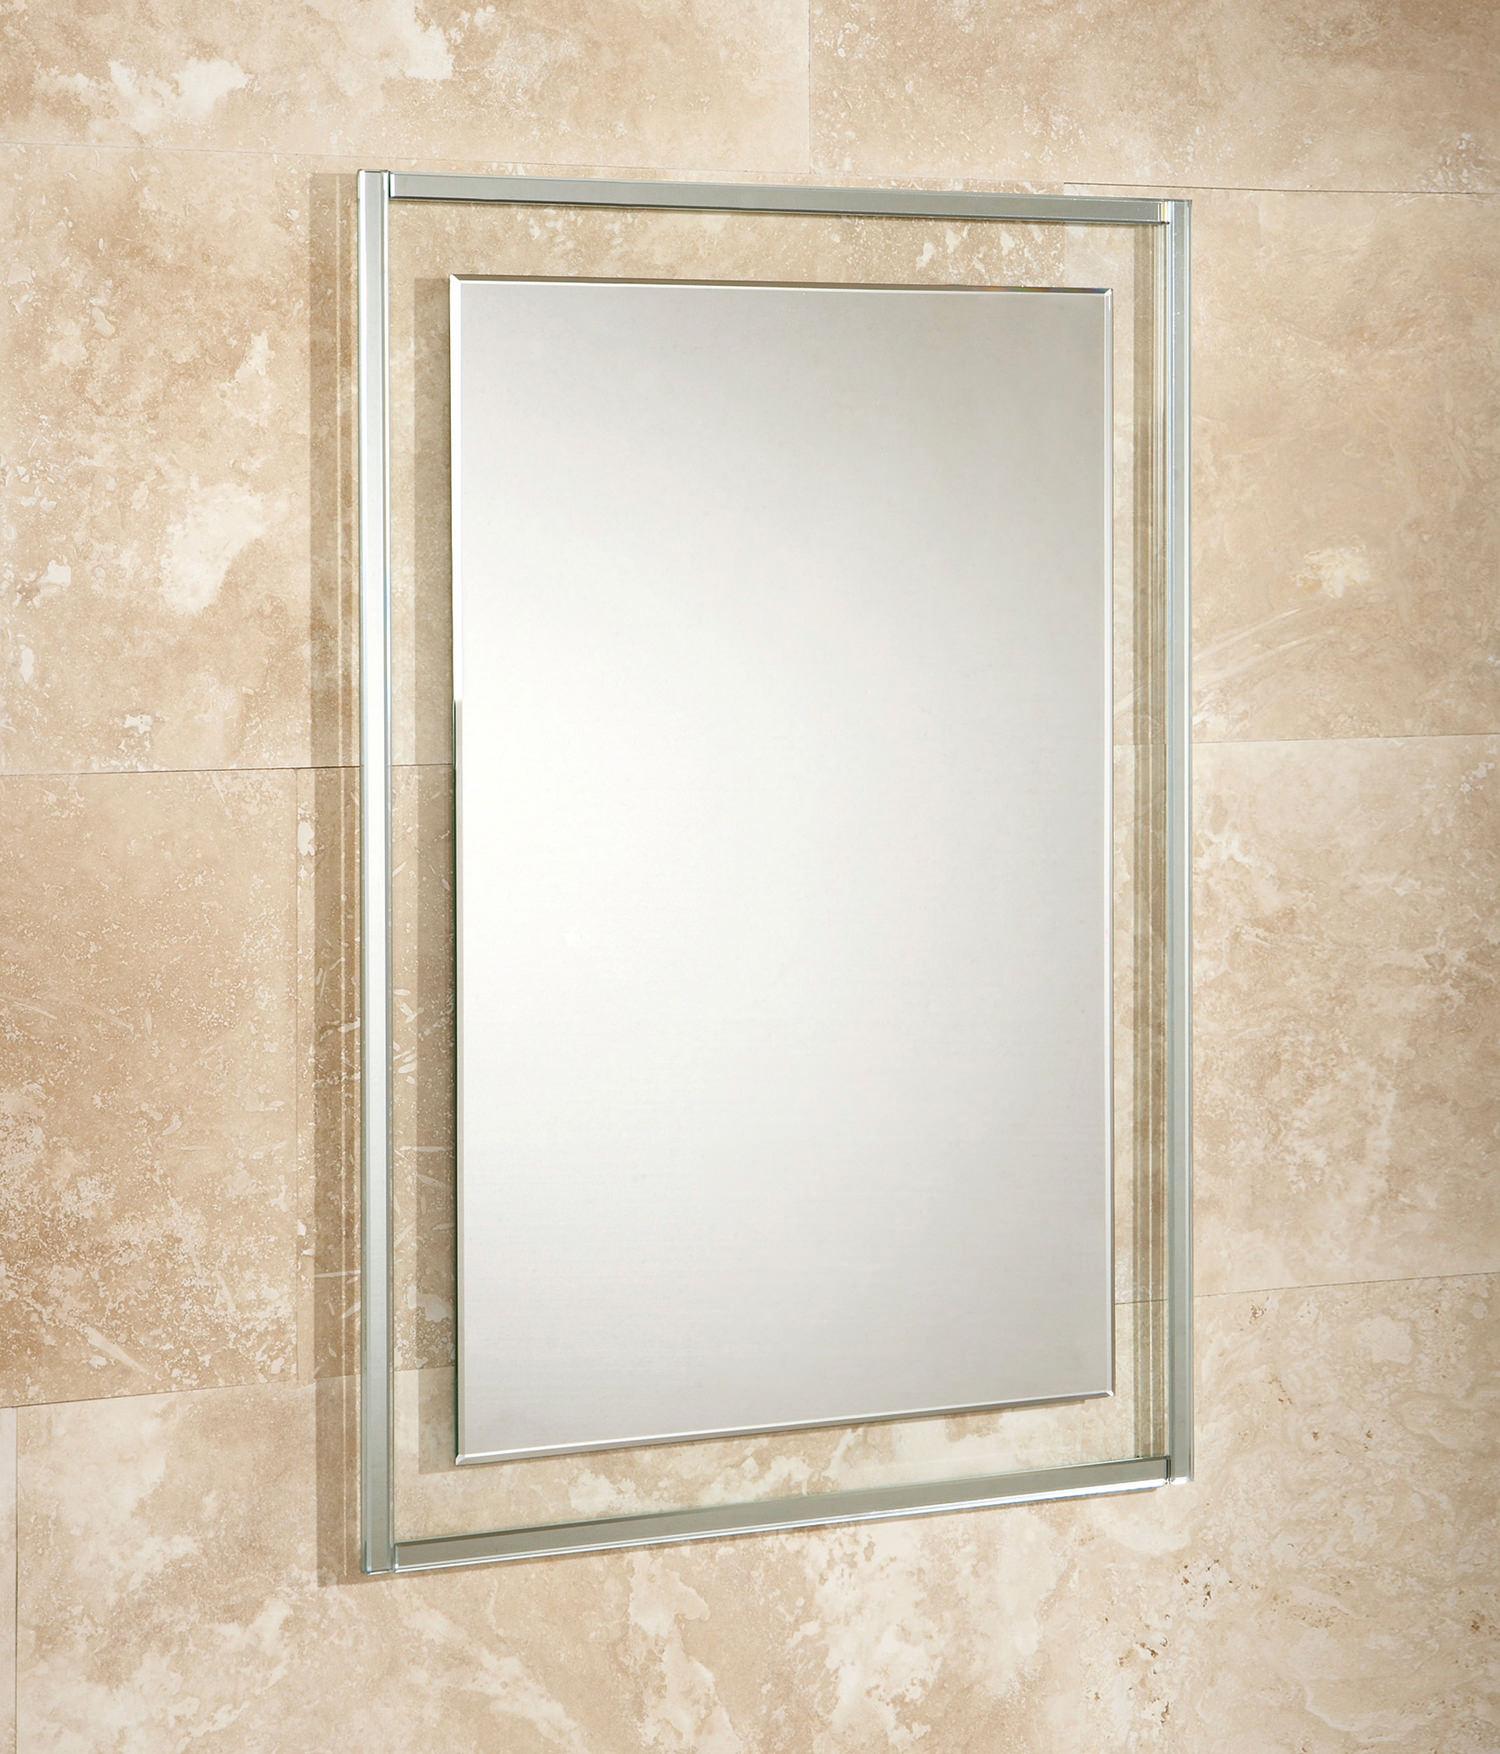 Hib georgia bevelled edge mirror on clear glass frame 500 - Replacement bathroom mirror glass ...